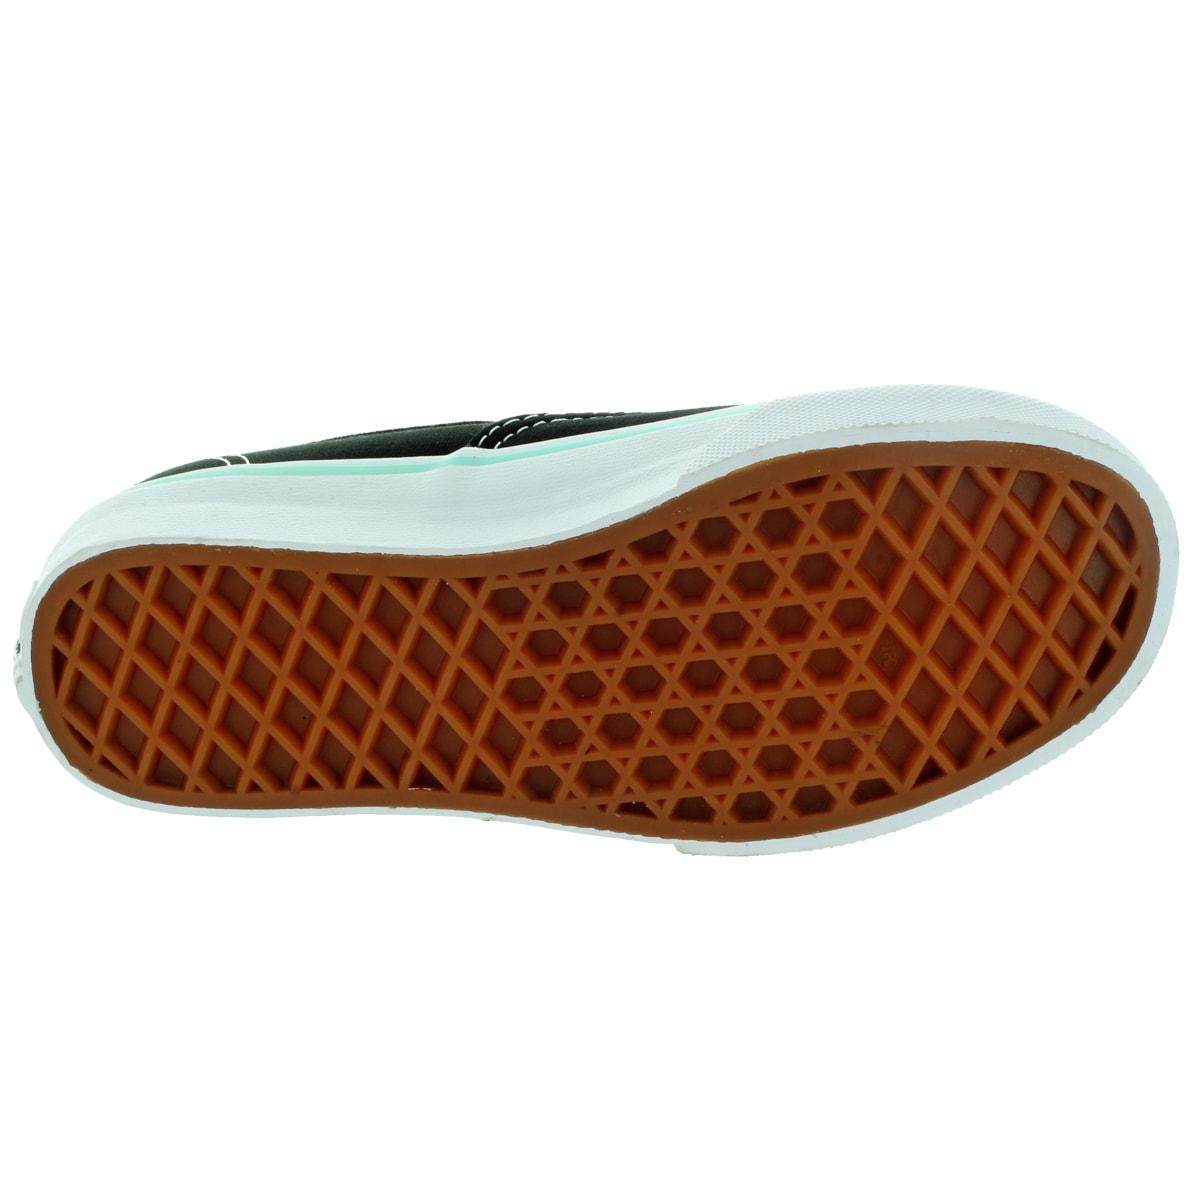 Shop Vans Kid s Authentic (Pop) Black Blue Tint Skate Shoe - Free Shipping  On Orders Over  45 - Overstock.com - 12323826 f9026de666f